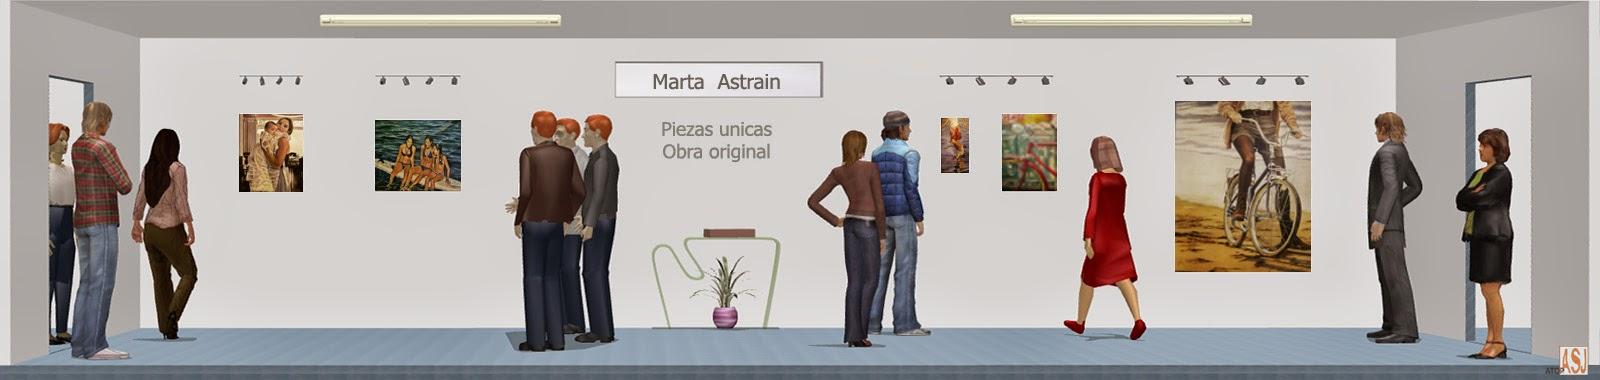 "<img src=""http://3.bp.blogspot.com/-GUdpyFvtgTk/U1WGdGgUULI/AAAAAAAAXkk/e68O5aIc9AE/s1600/sala_de_marta_astrain.jpg"" alt=""Sala de Exposición virtual de pinturas y retratos de Marta Astrain""/>"